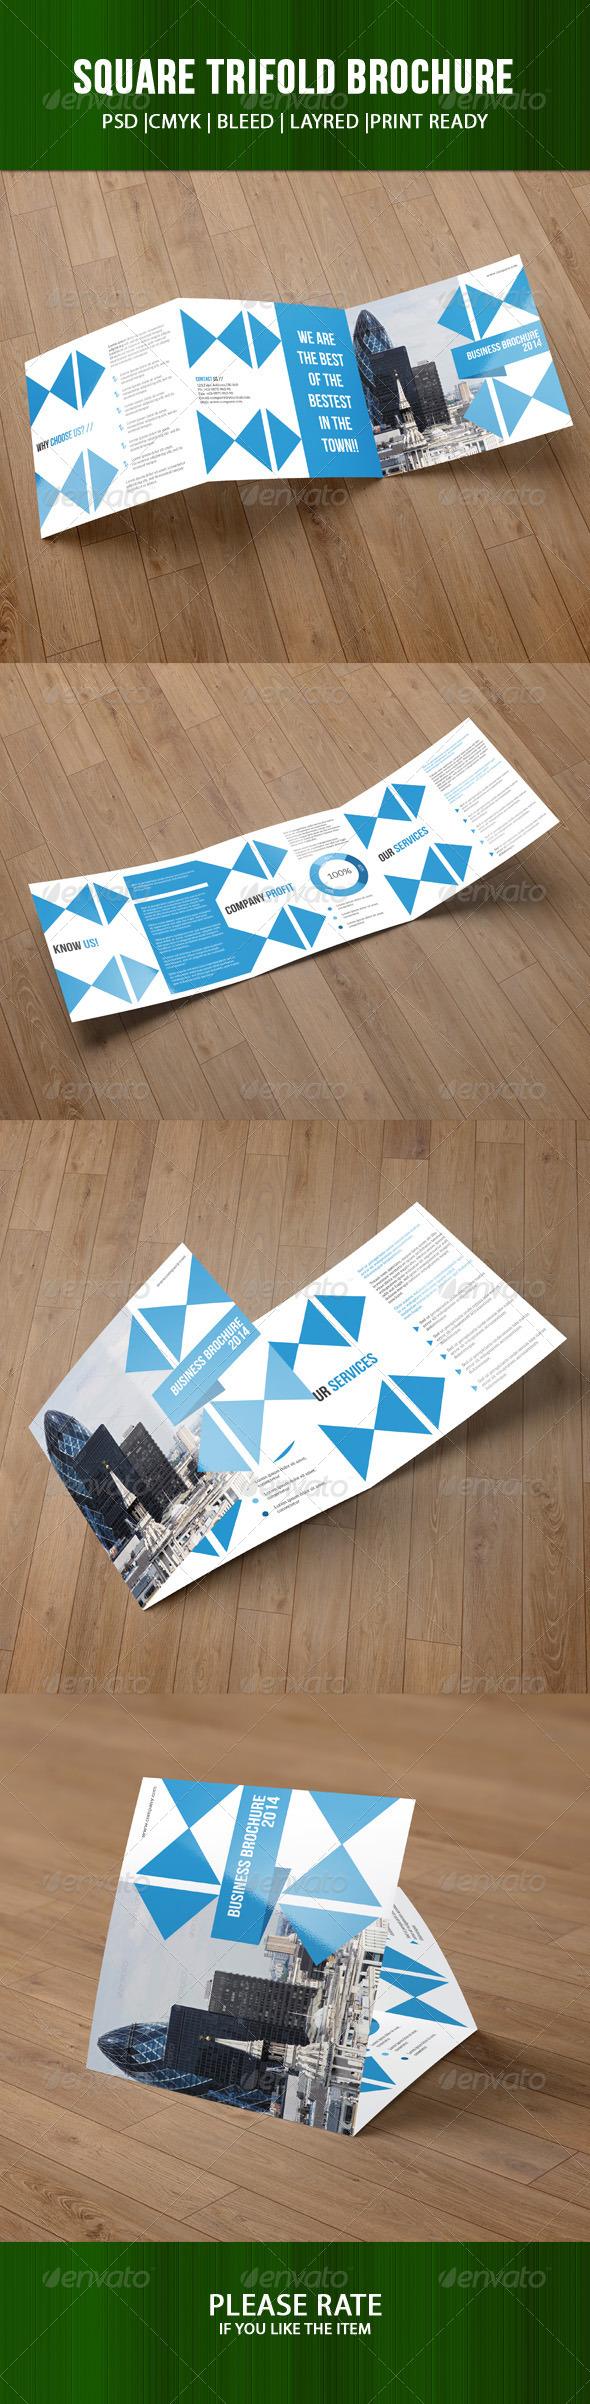 GraphicRiver Square Trifold Business Brochure-V02 7798563